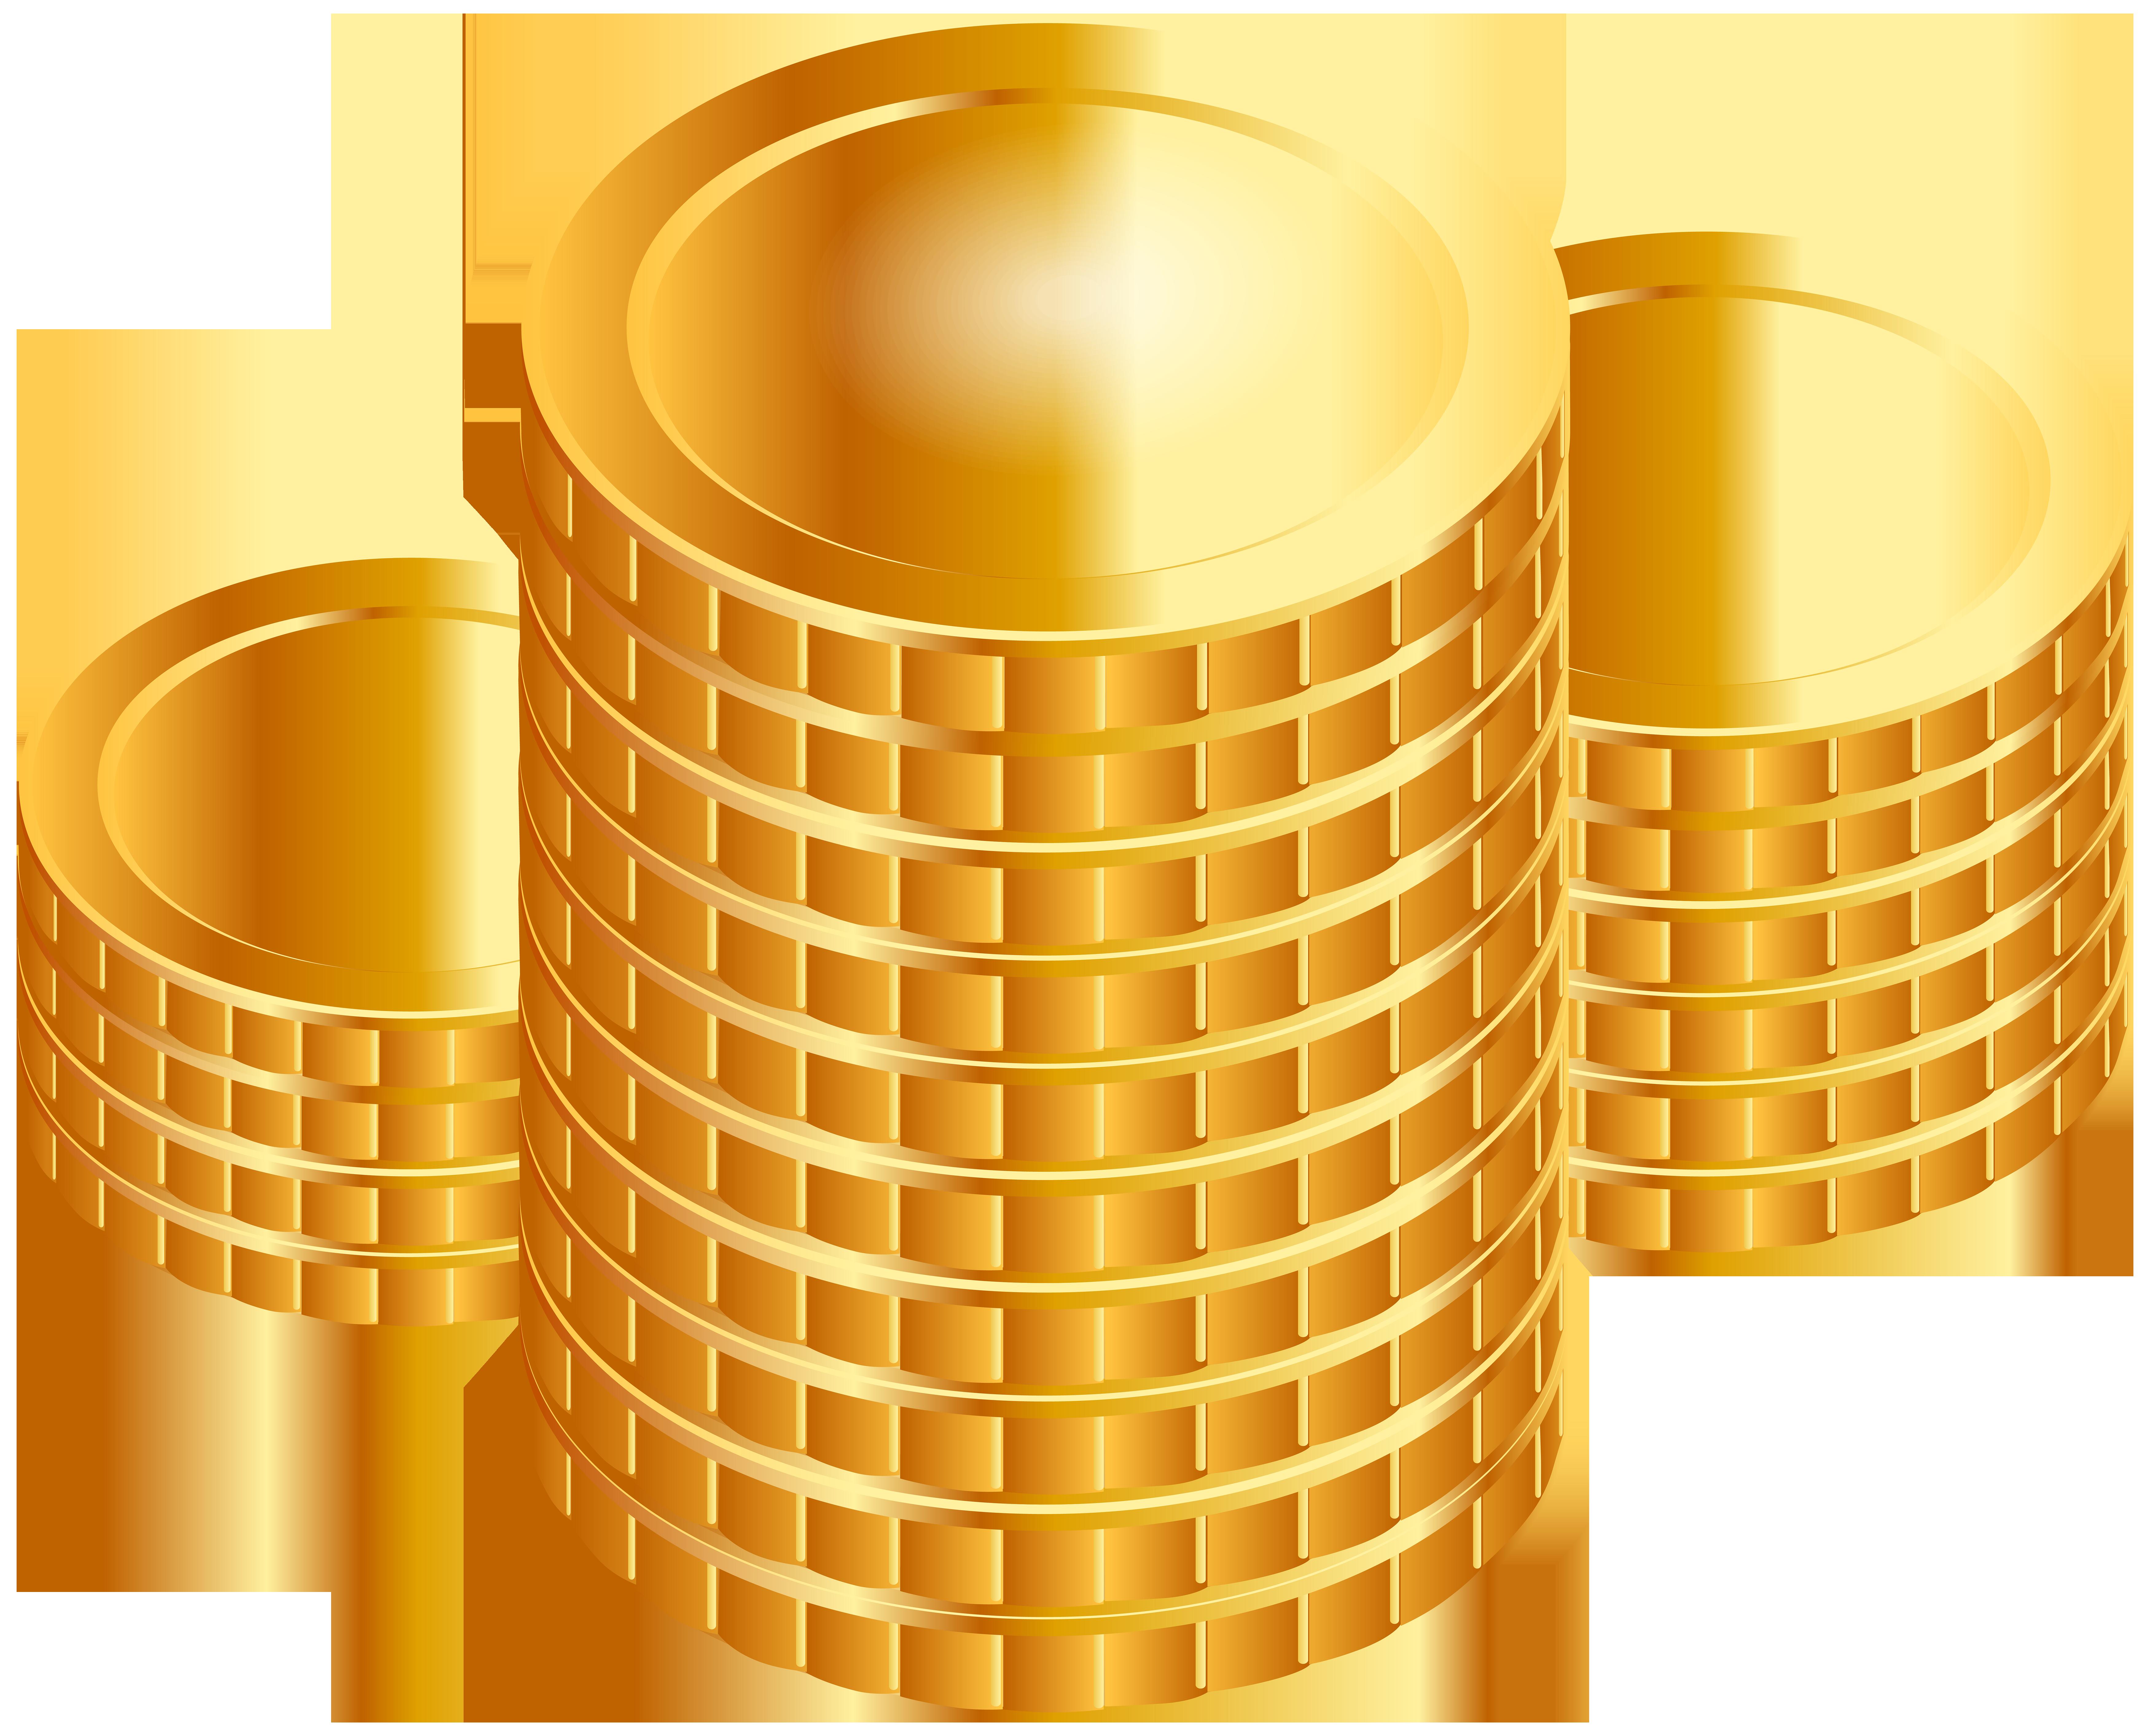 Coin clipart plain gold. Coins png clip art